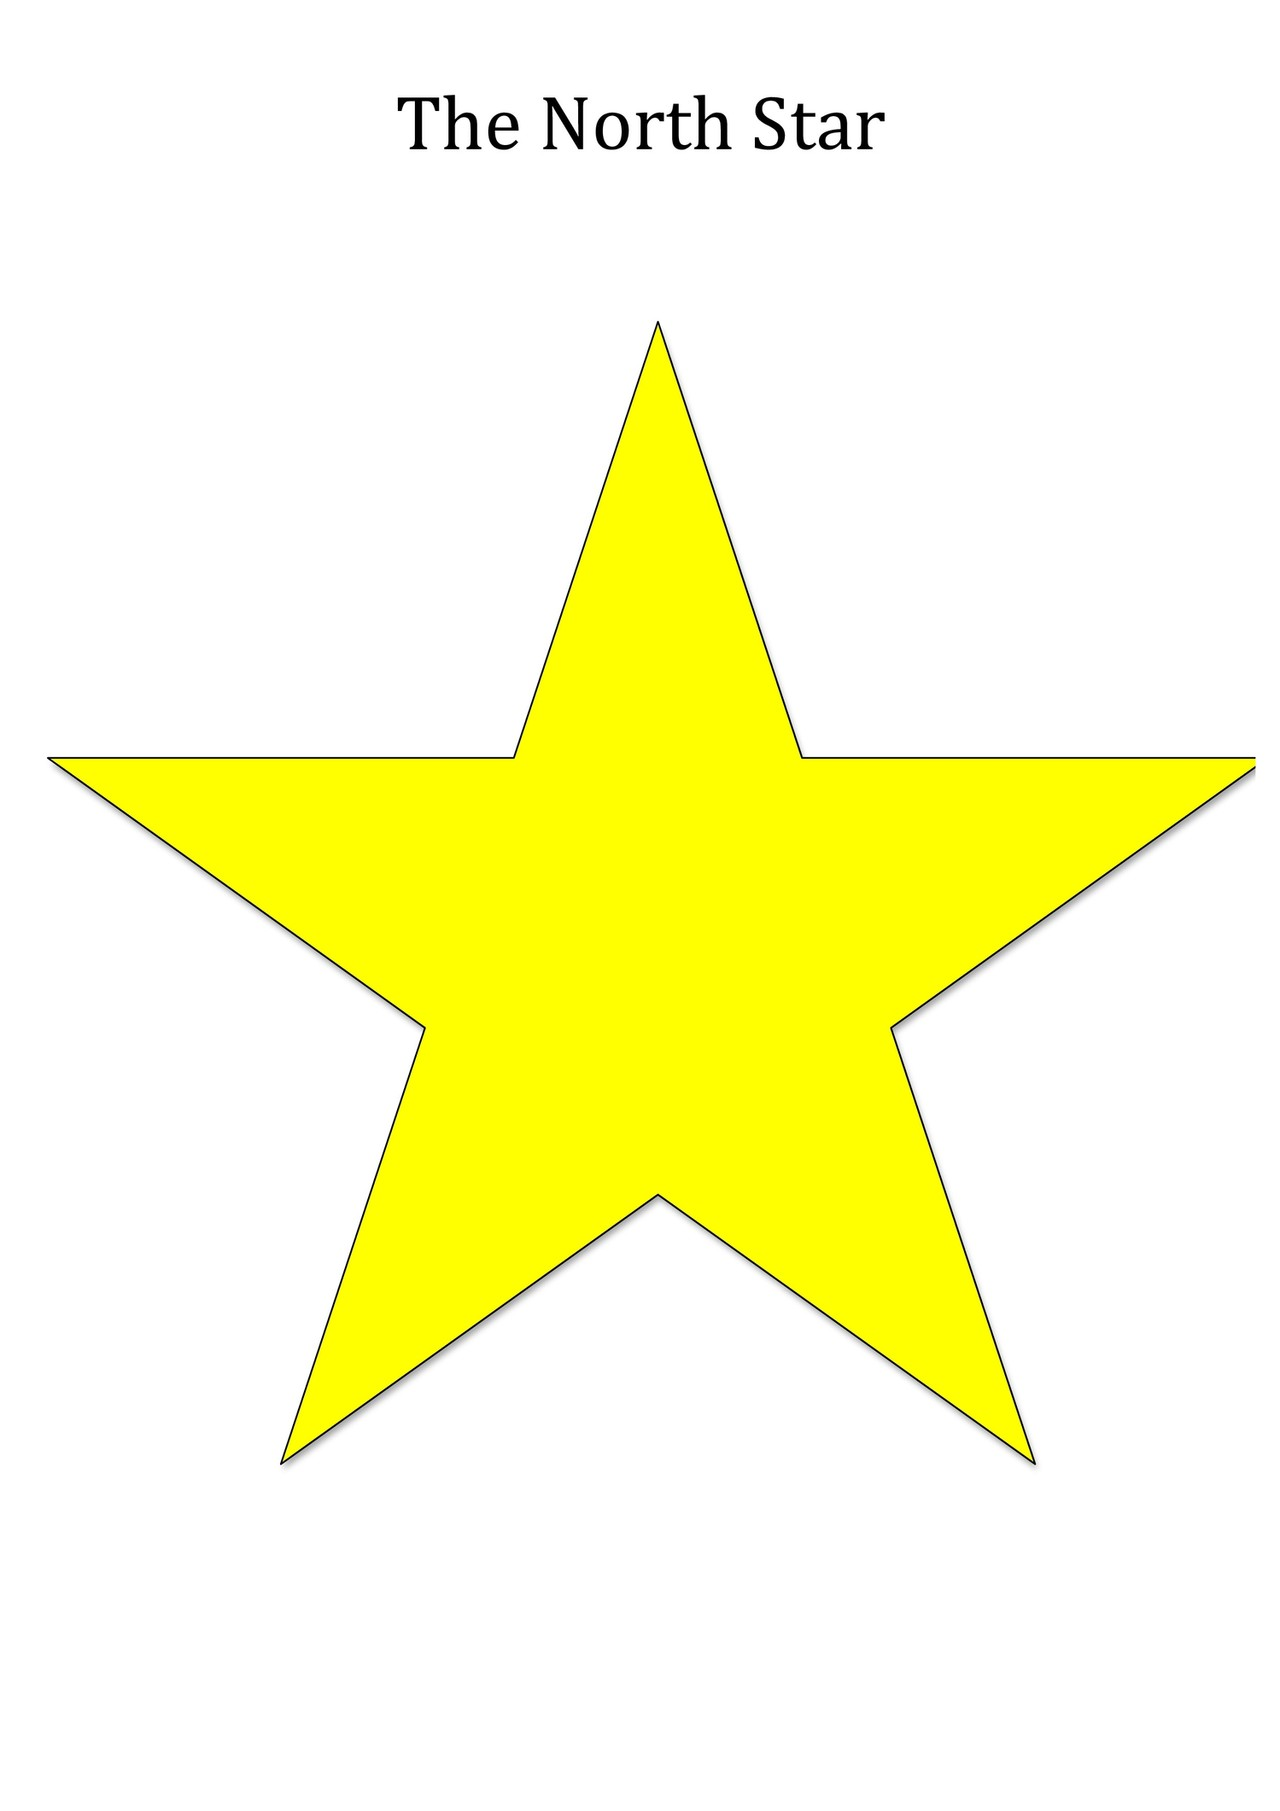 North Star Image for Teaching Seasons | UNAWE